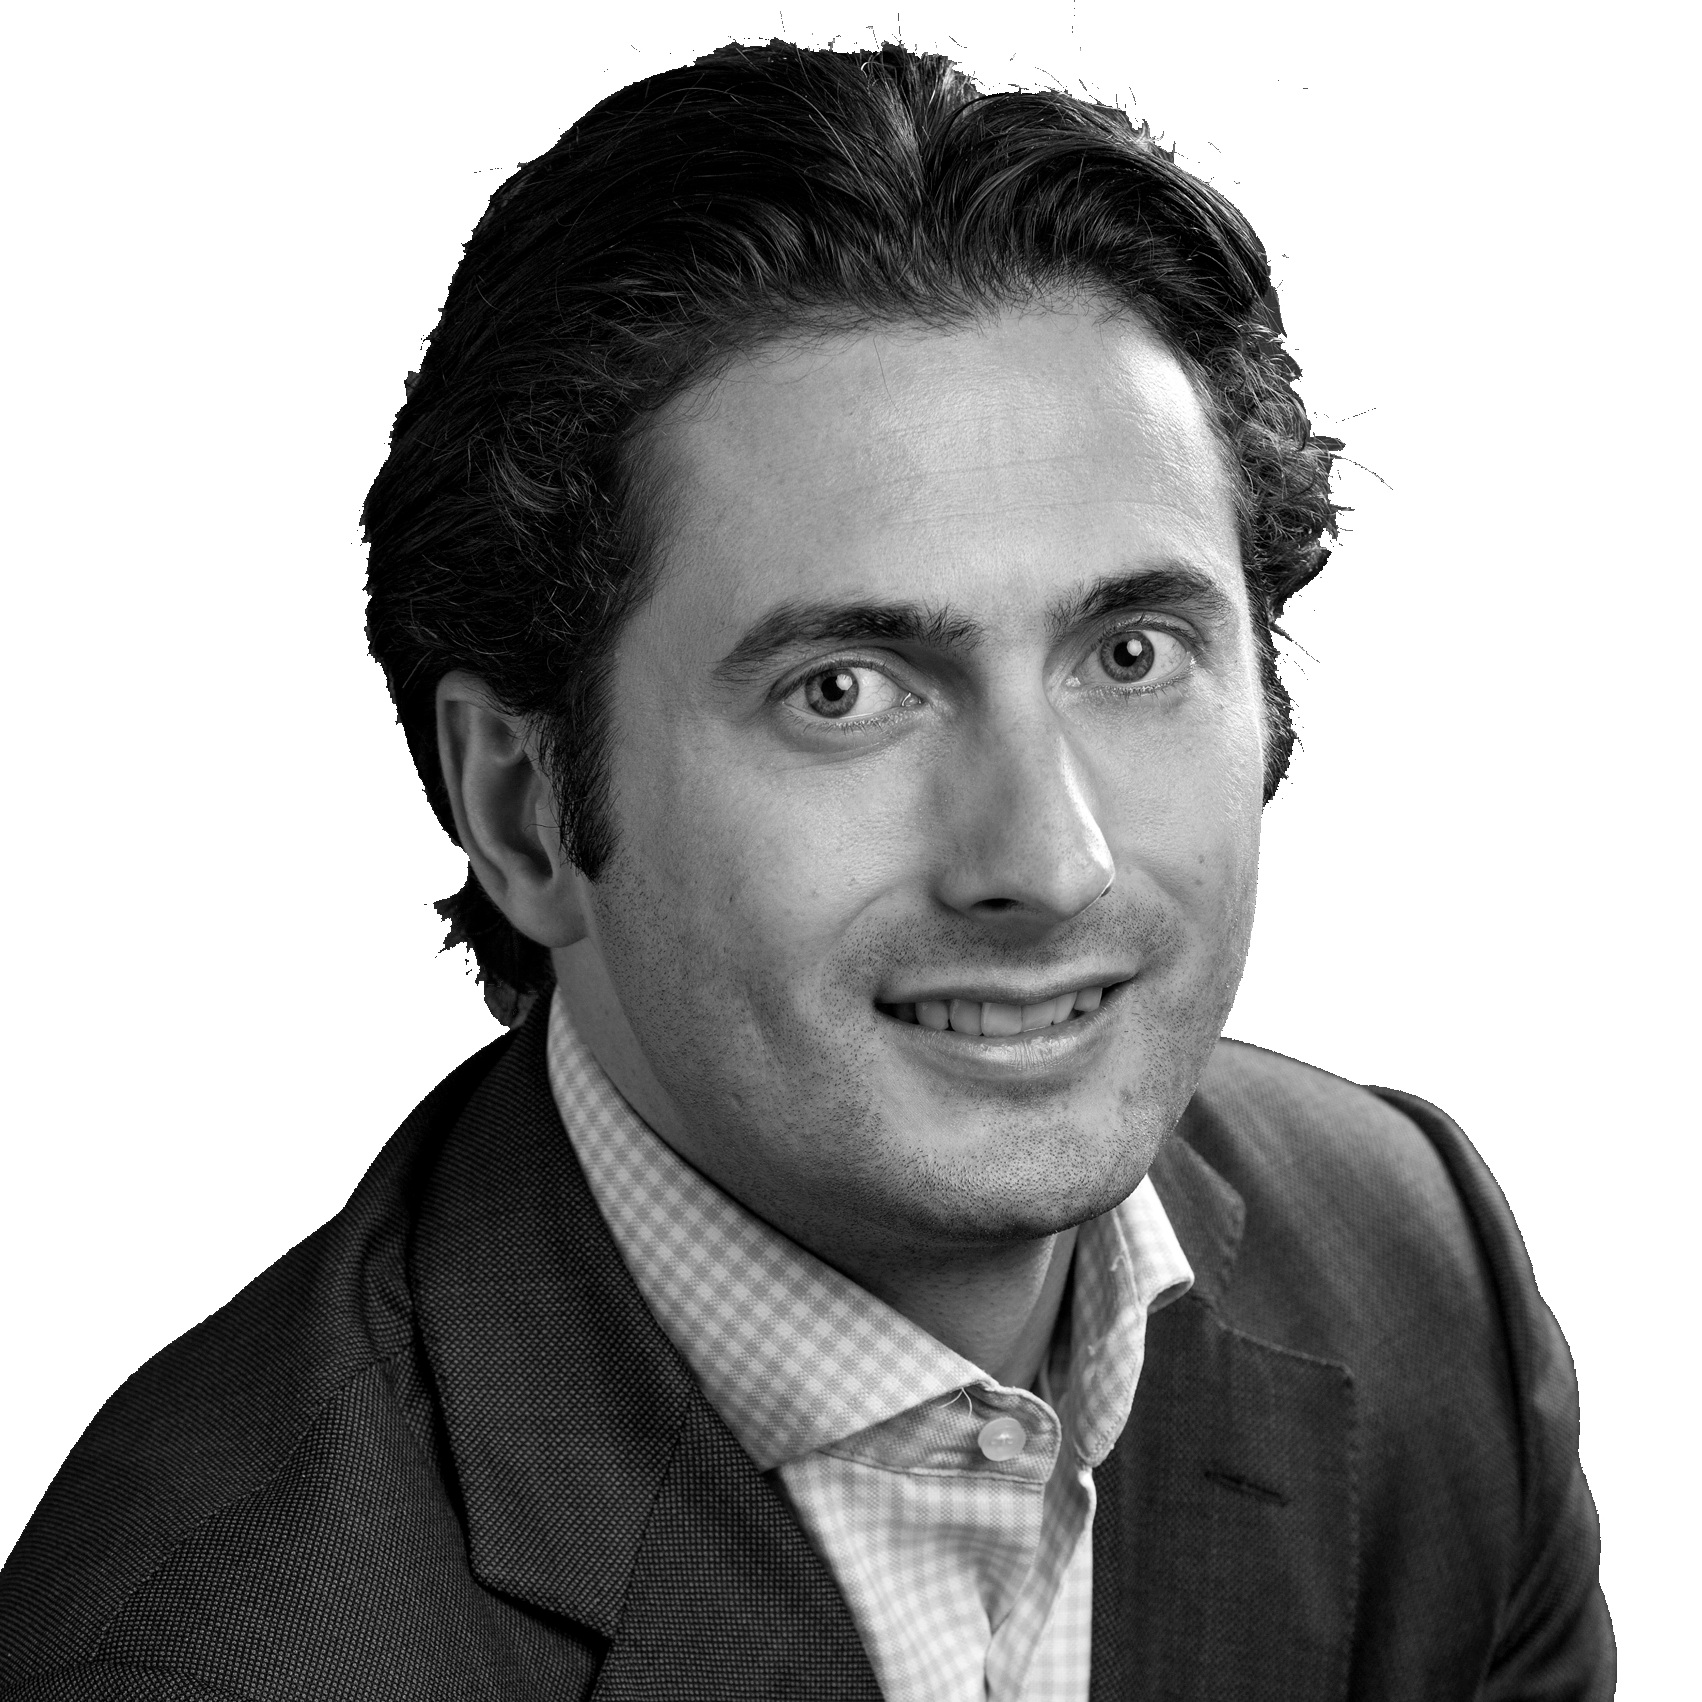 MARK VAN RIJMENAM - Founder of Datafloq